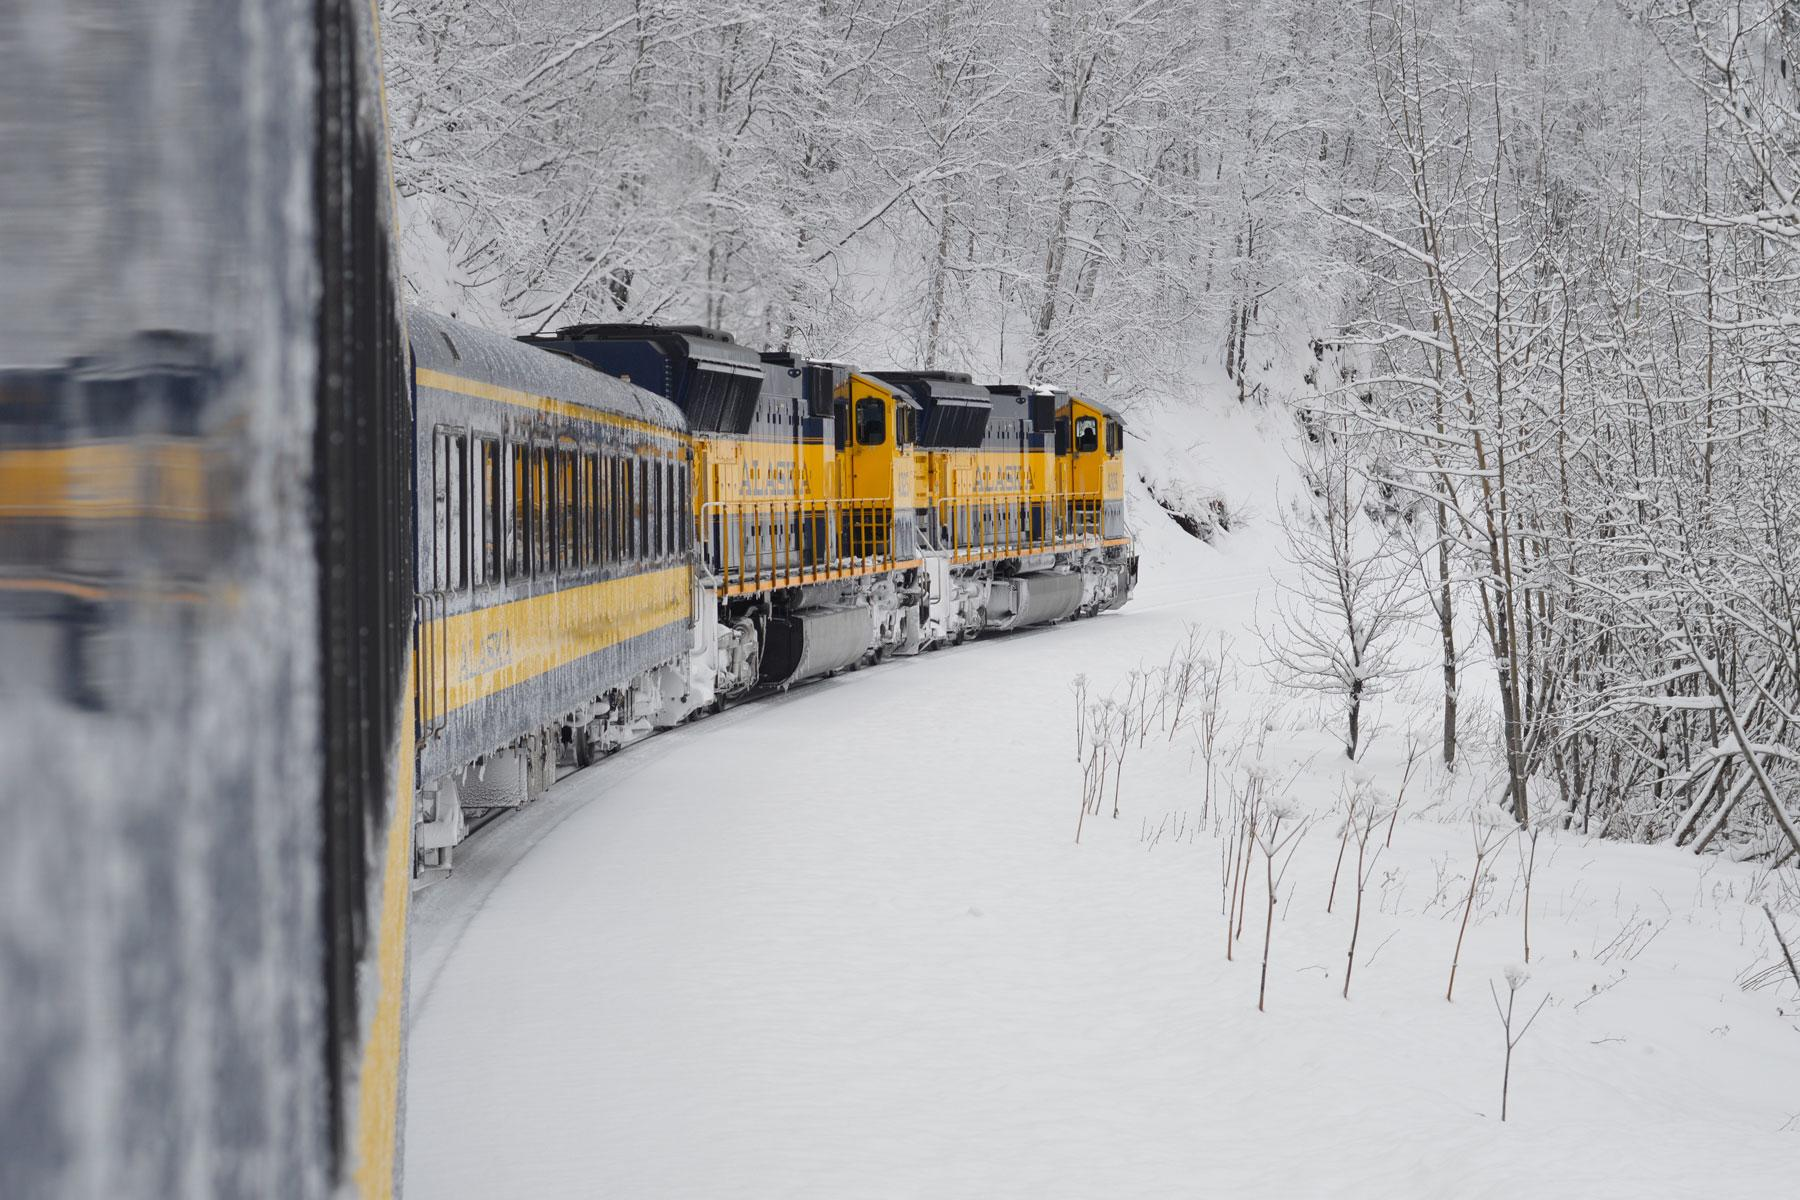 Christmas Train Ride Nj.14 Winter Train Rides